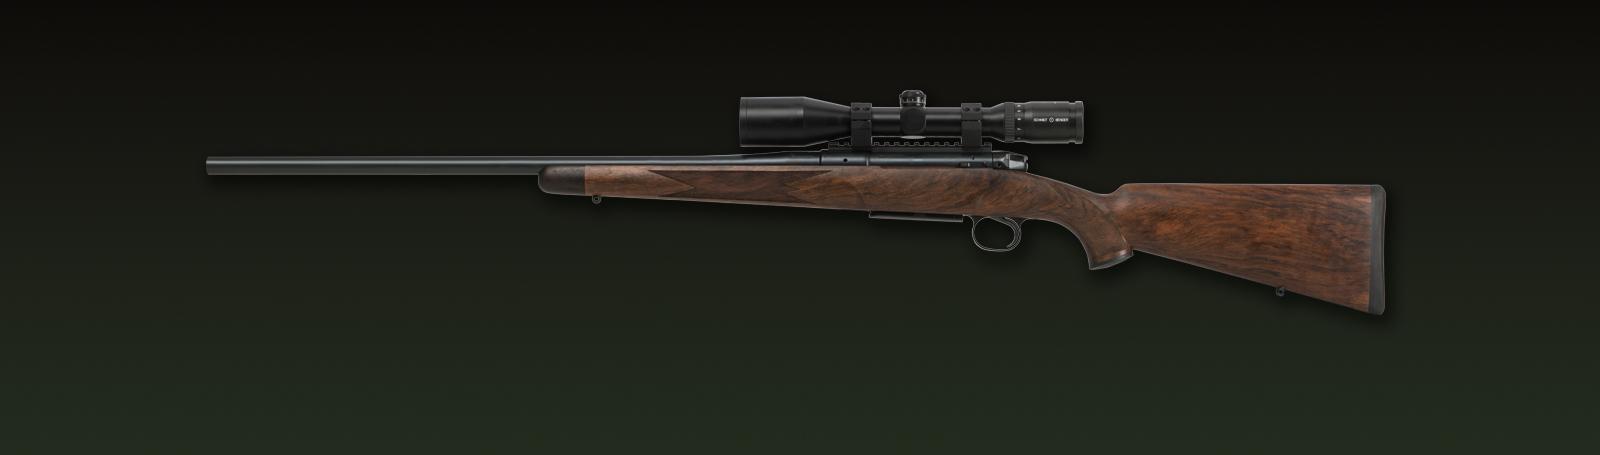 HEYM High-Performance Precision Rifle (HPPR)